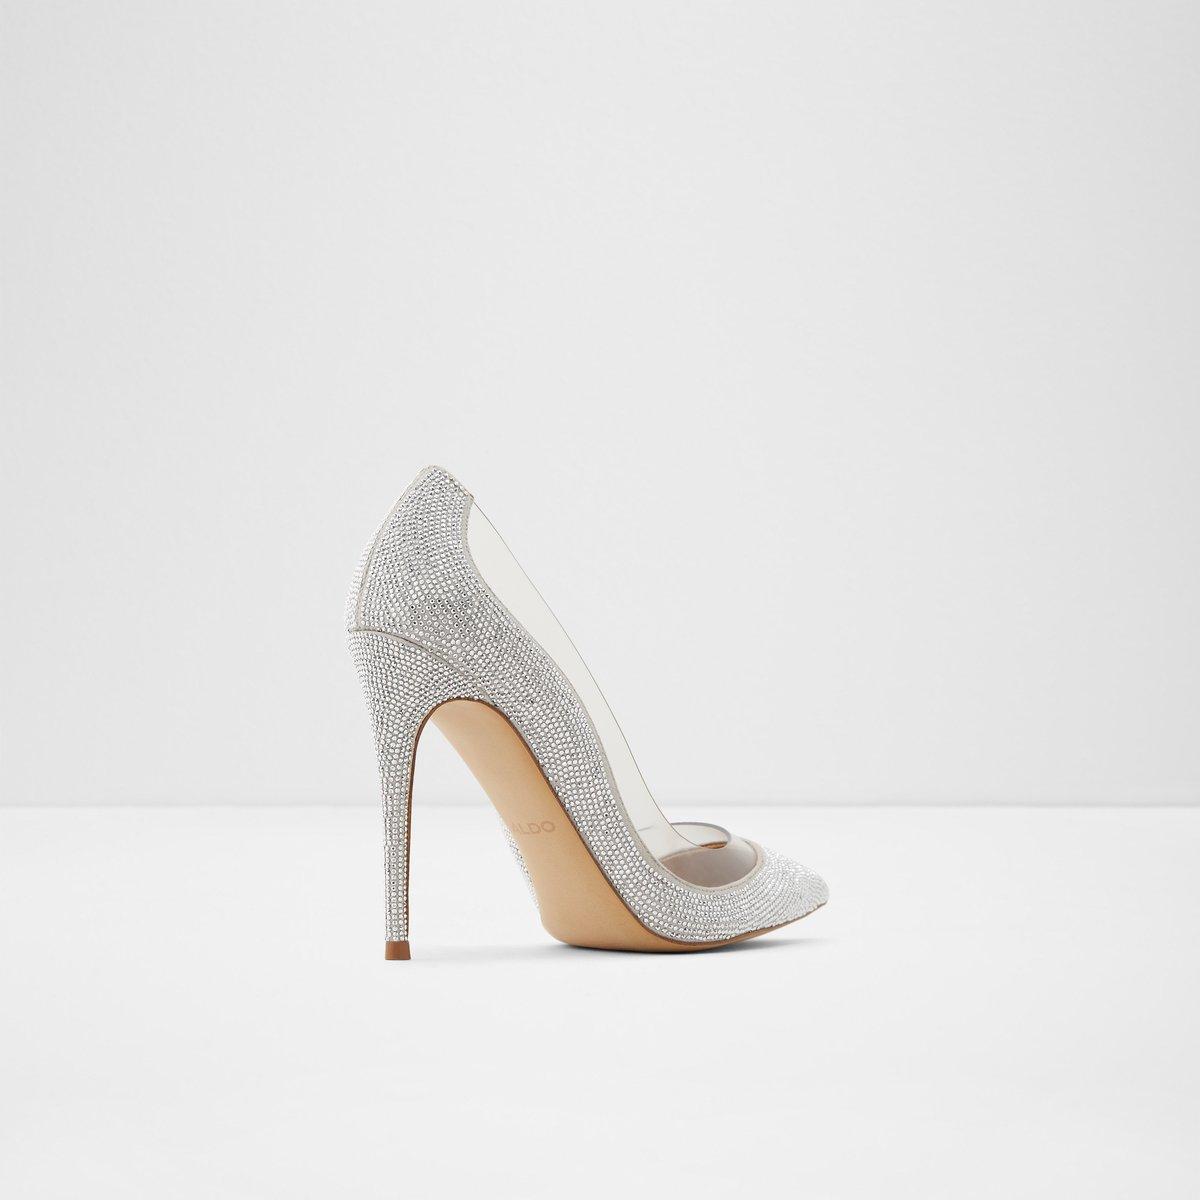 Edulla Silver Women's Heels | ALDO US